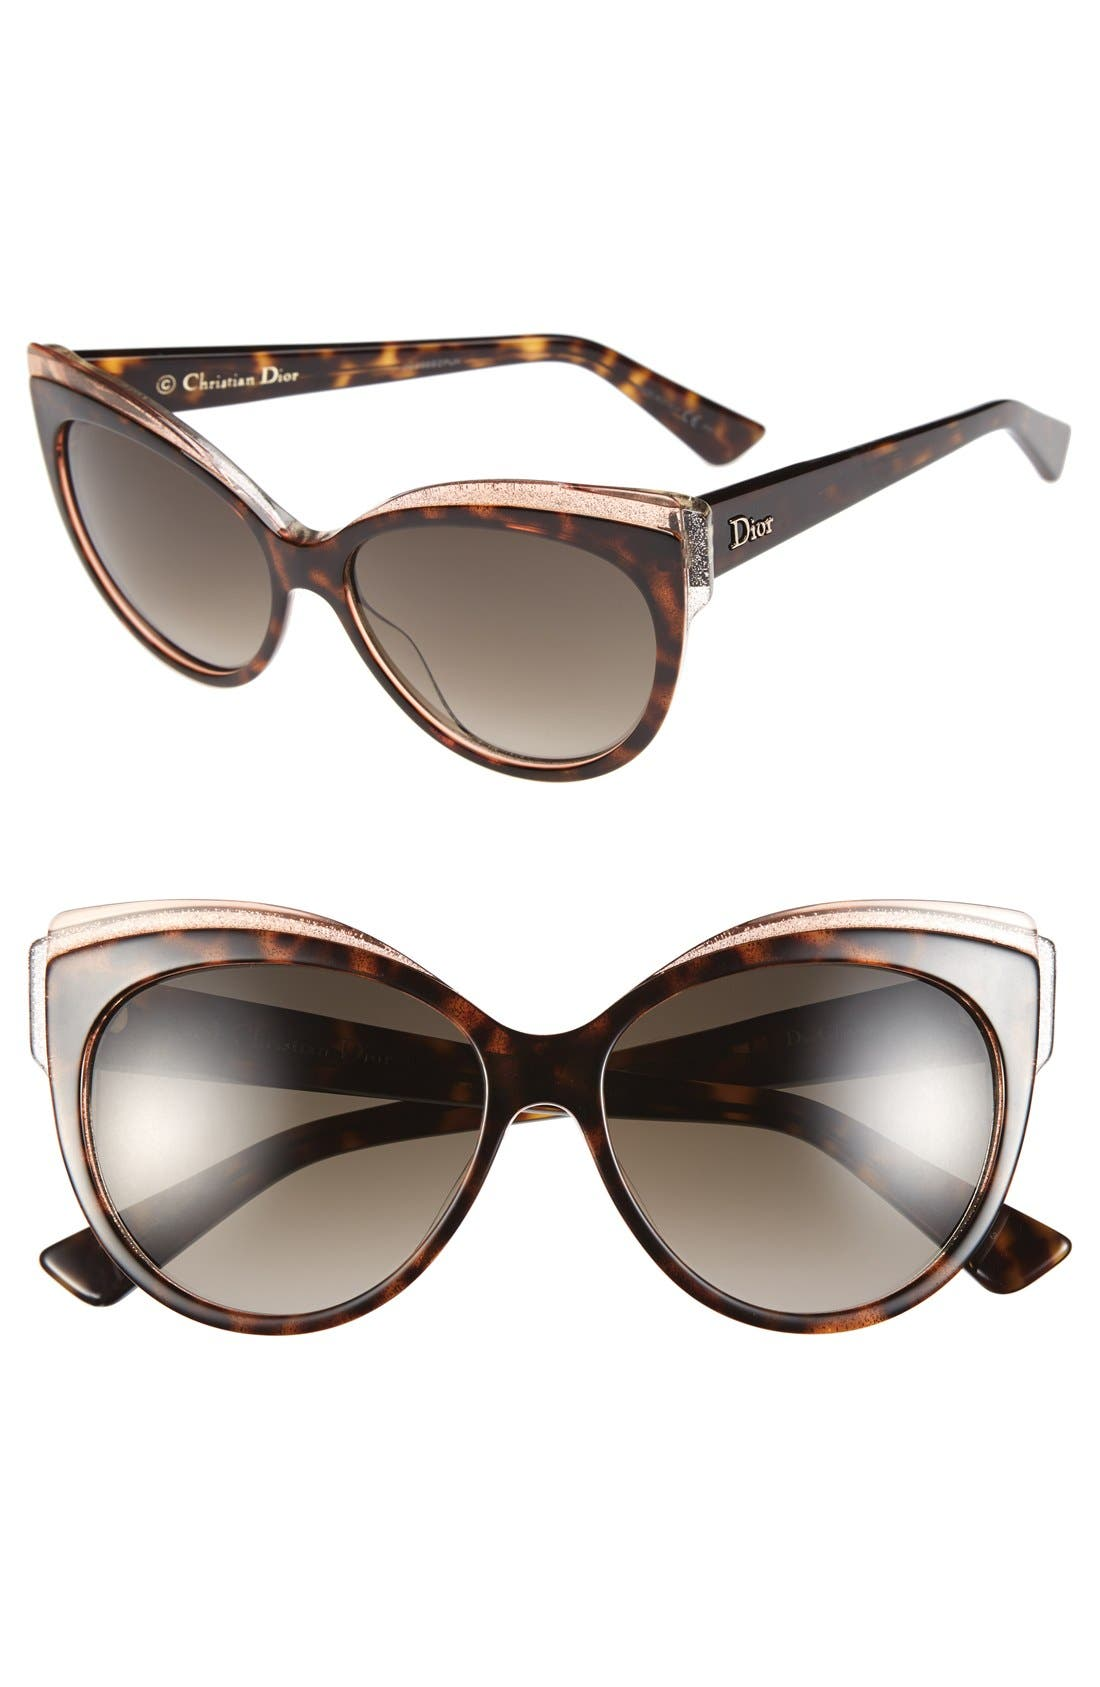 Main Image - Dior 'Glisten 1' 56mm Cat Eye Sunglasses